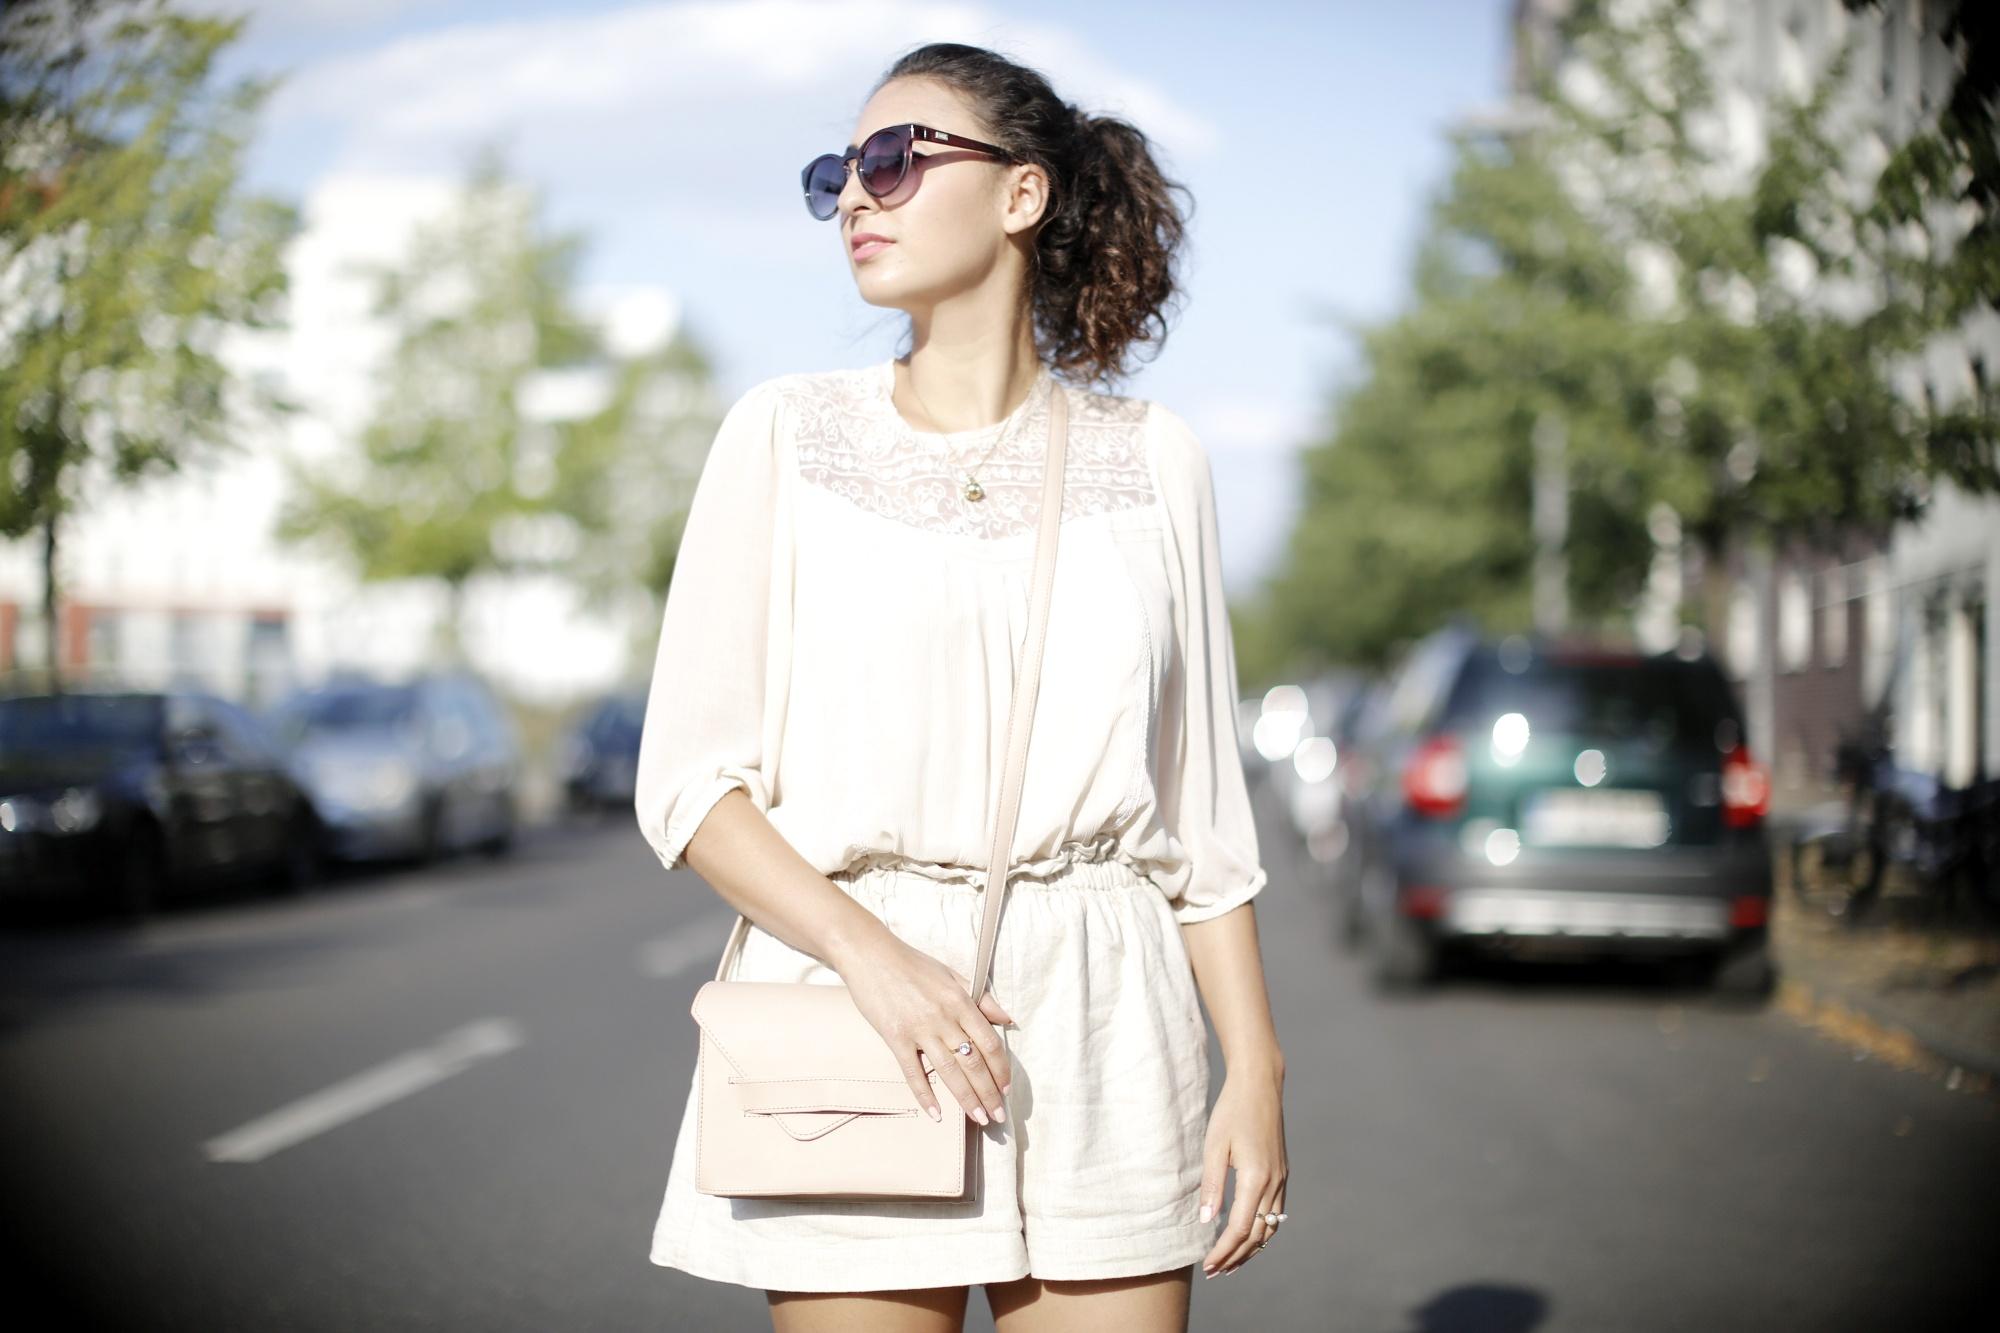 Golden Sliders goldene pantoletten leinen shorts linen shorts white lace blouse cream nude bag mules metallic